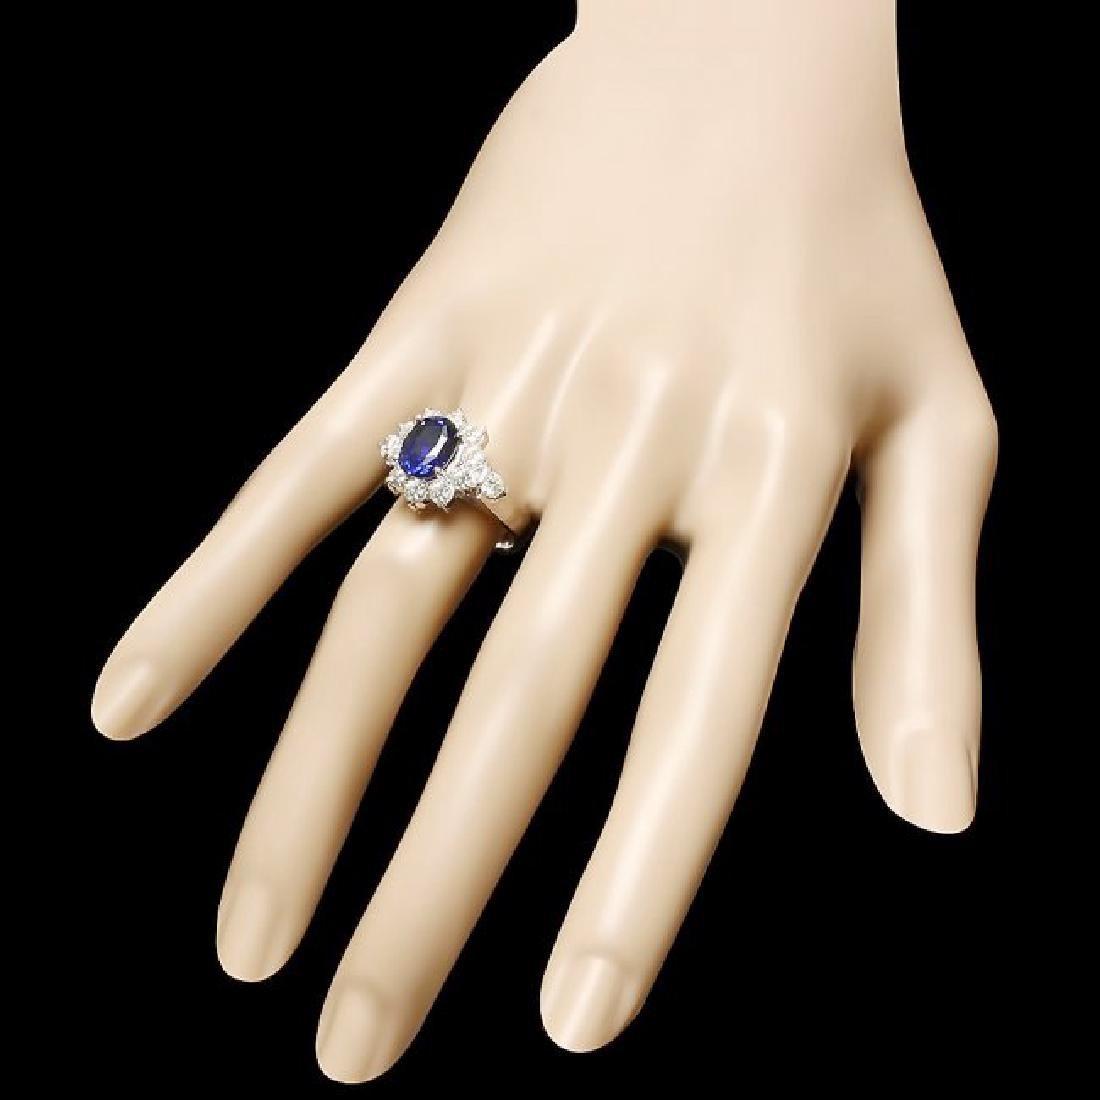 14k Gold 3.00ct Sapphire 1.30ct Diamond Ring - 3